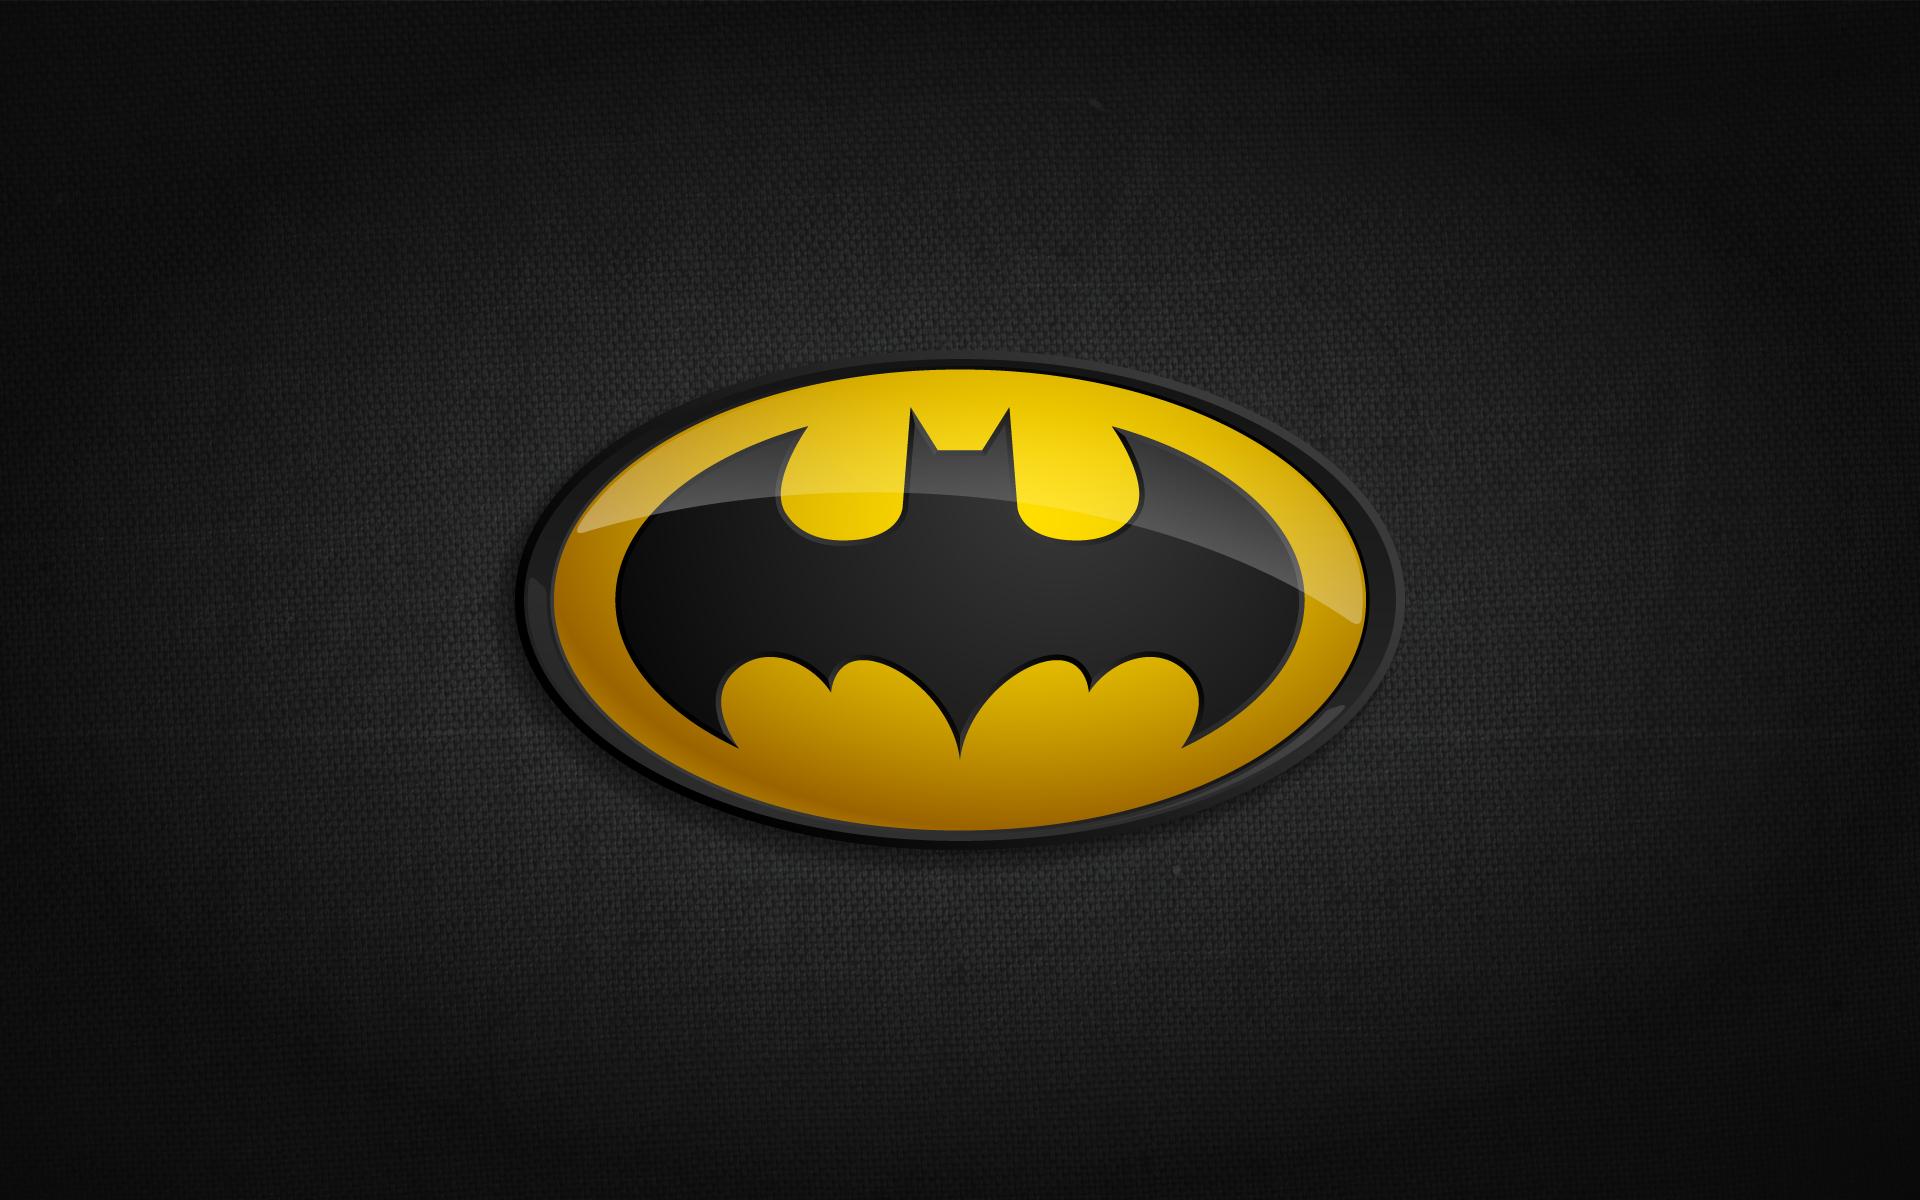 Batman Wallpapers HD Bonus[ DC Marvel MK ]   Taringa 1920x1200